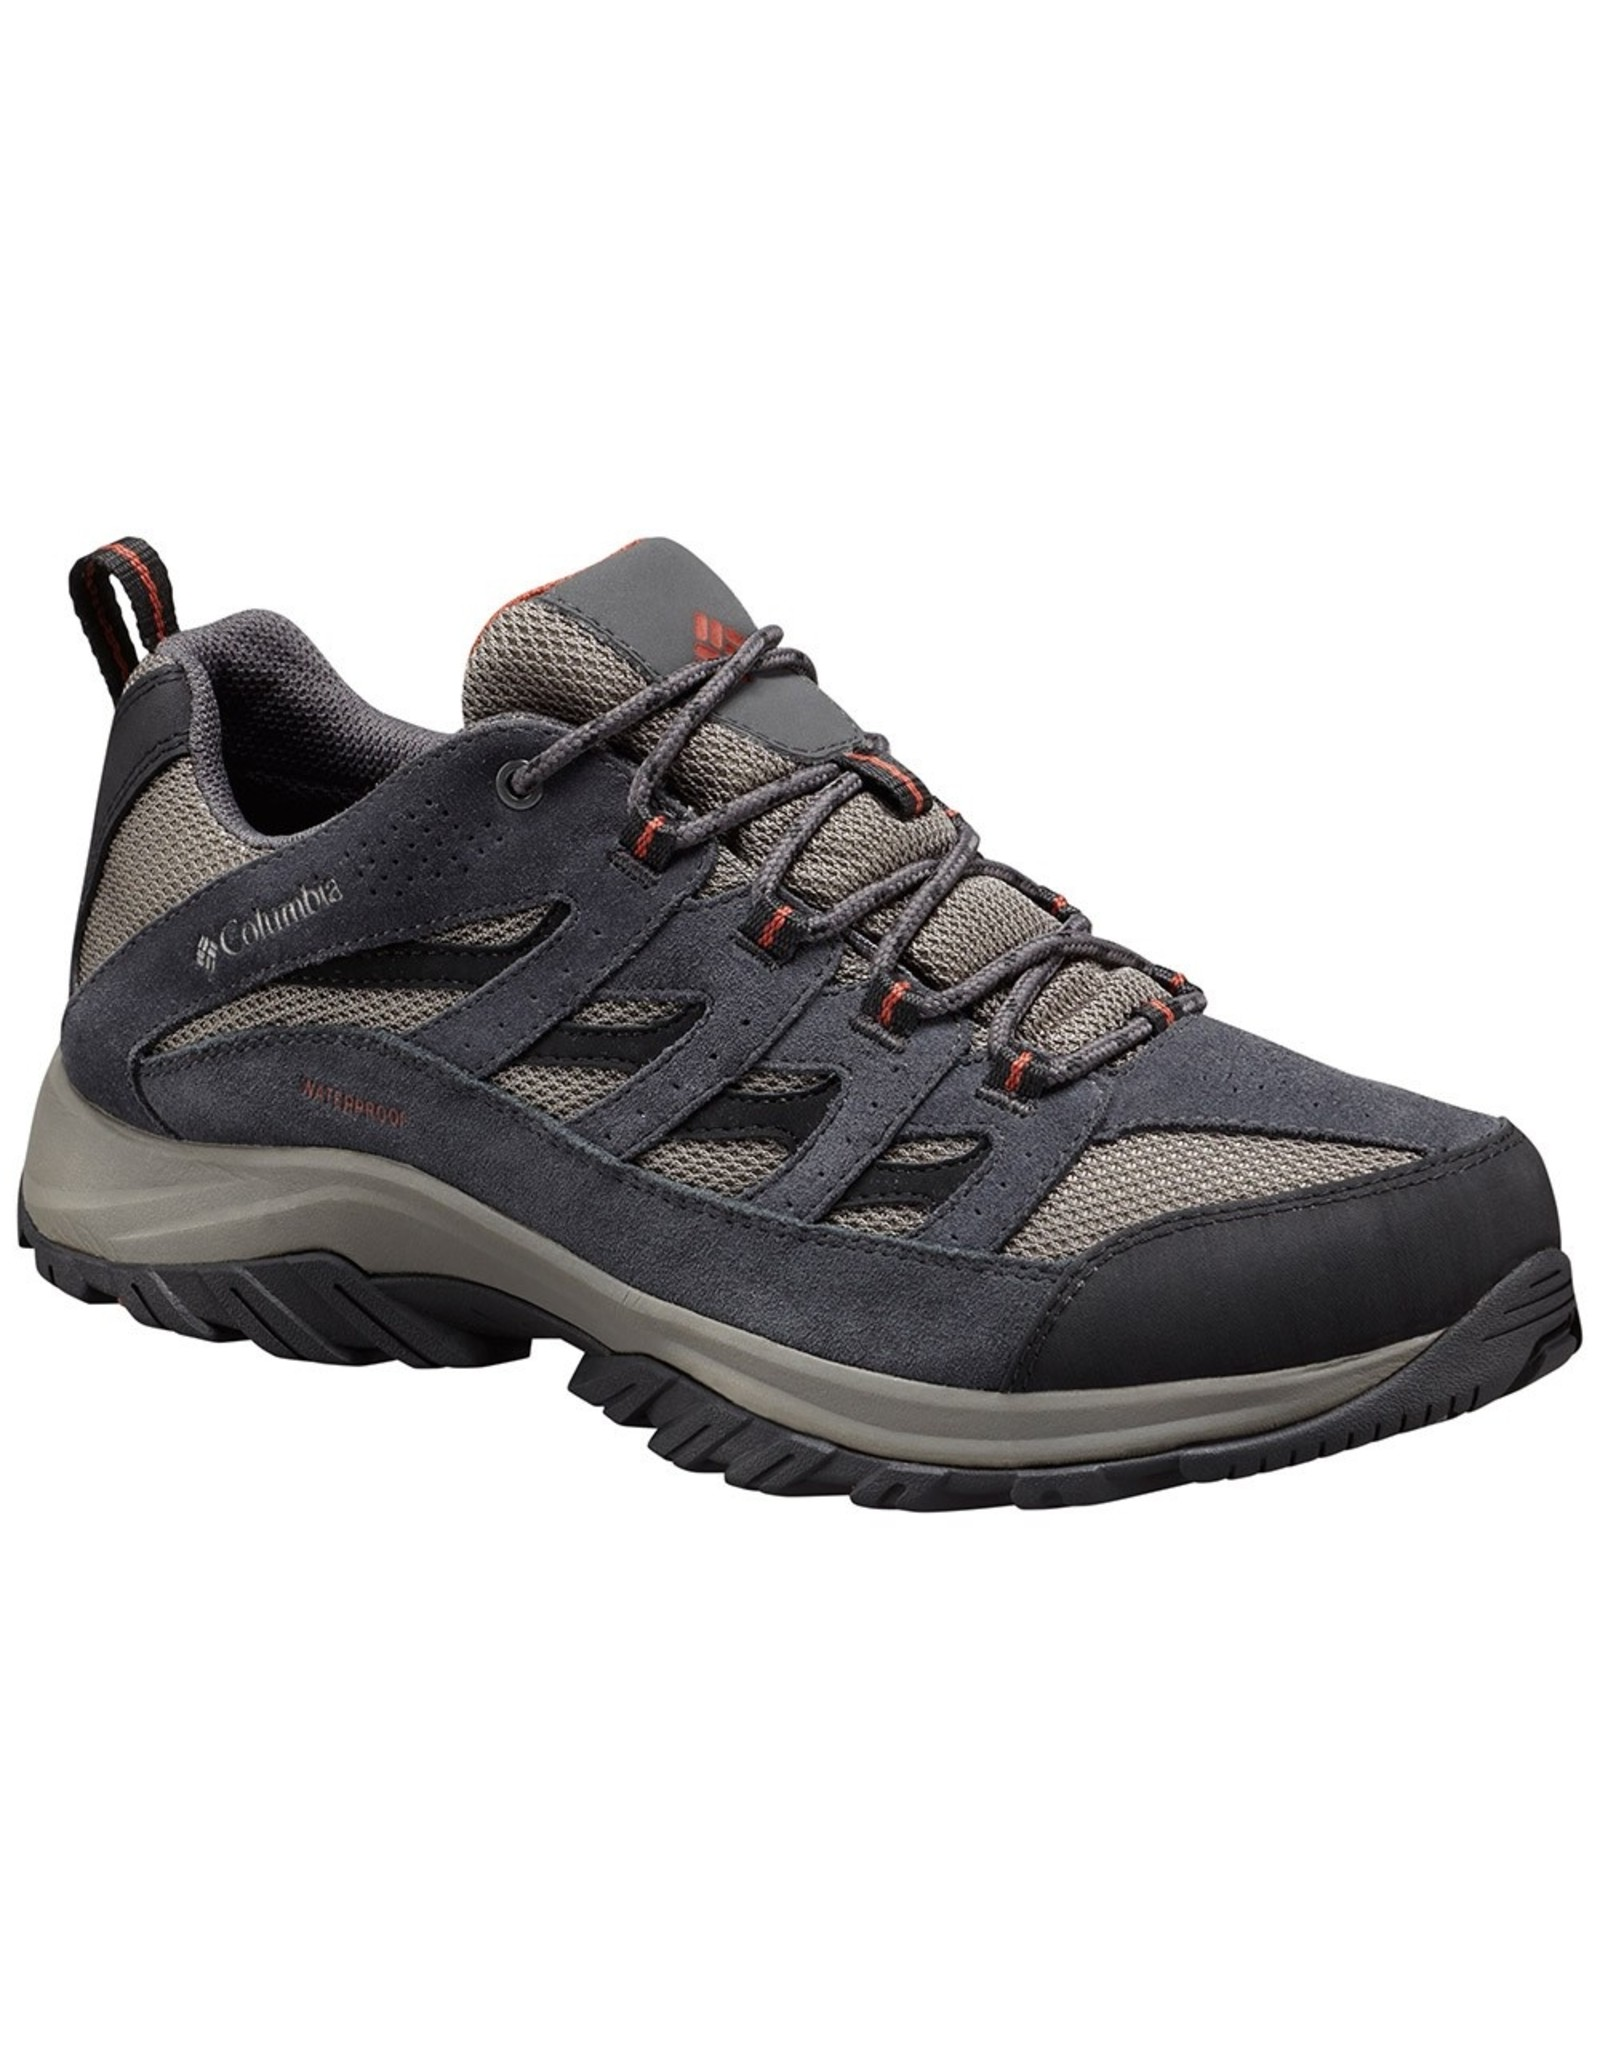 Columbia Columbia - Men's Crestwood Hiking Shoe